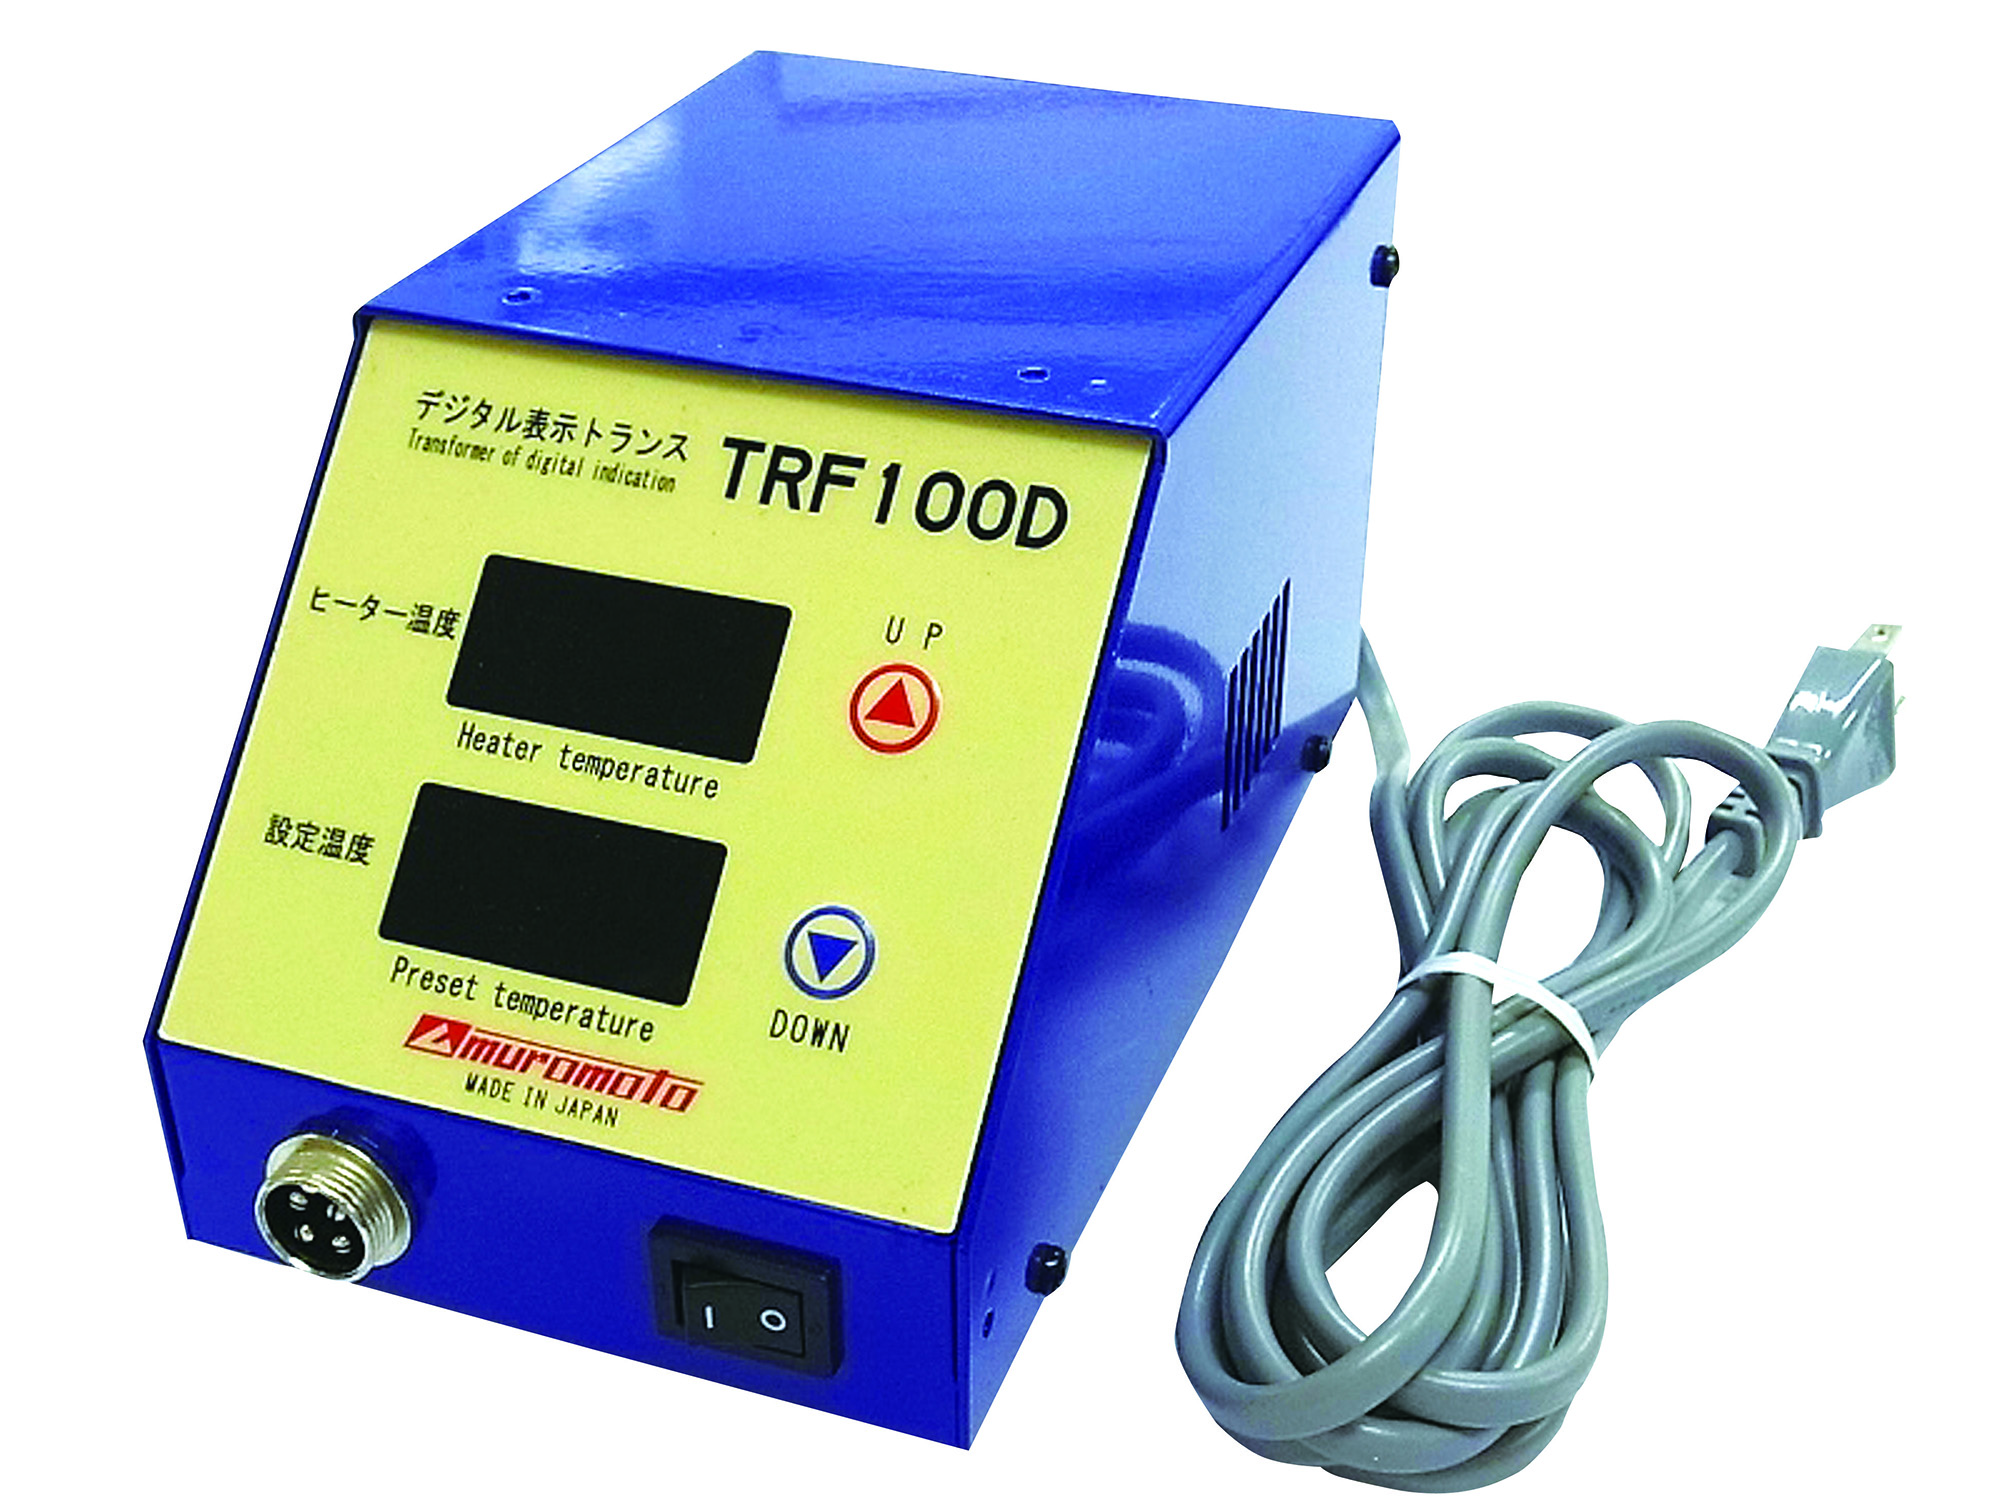 TRF100D デジタル表示新トランス